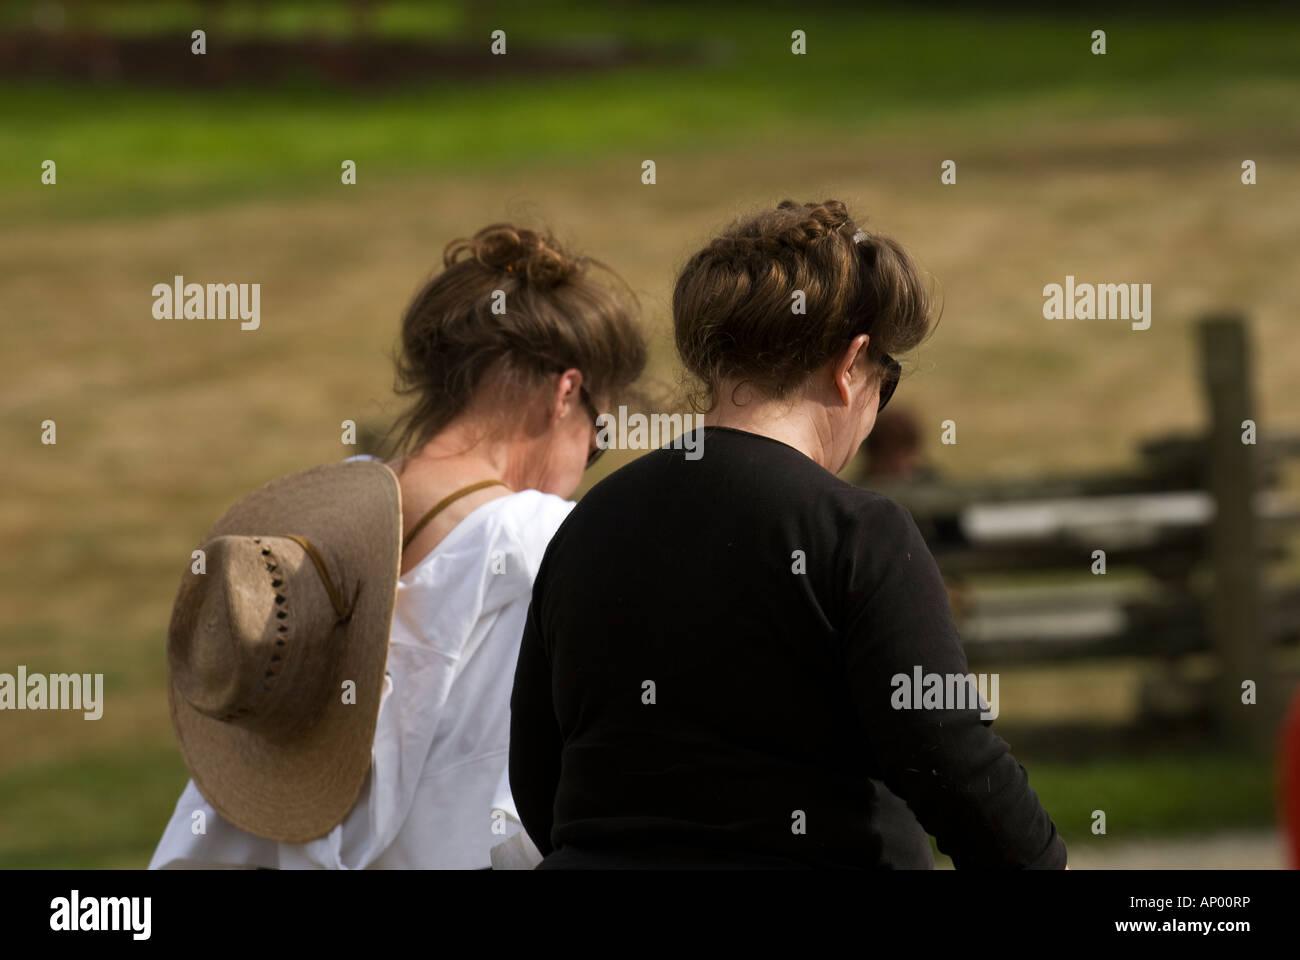 2 middle aged women look-alike walking towards fence - Stock Image